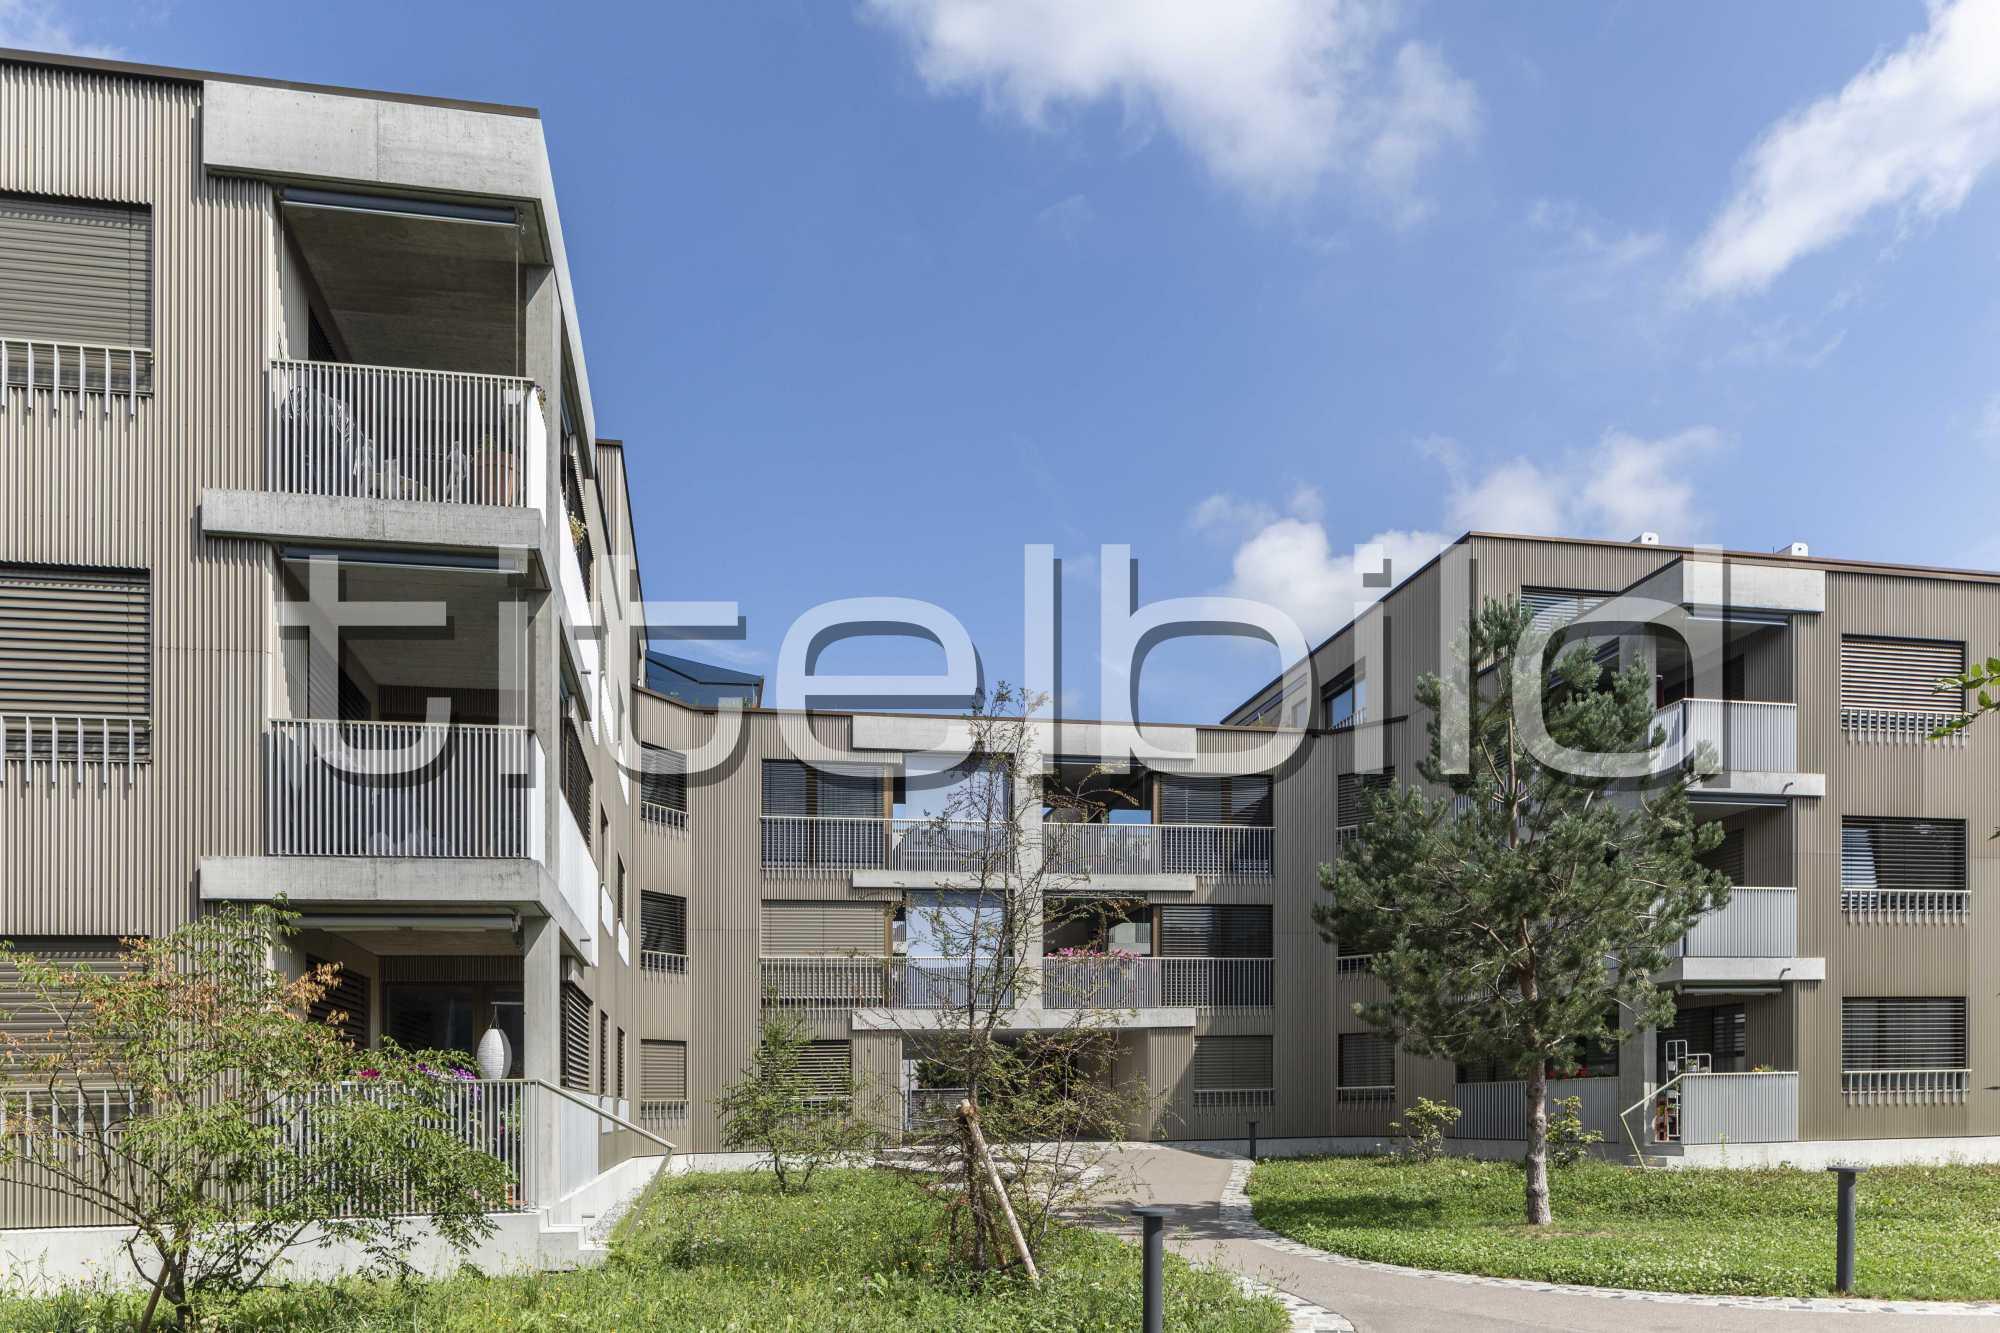 Projektbild-Nr. 0: Neubau Siedlung Riedgraben (Siedlungslokal)